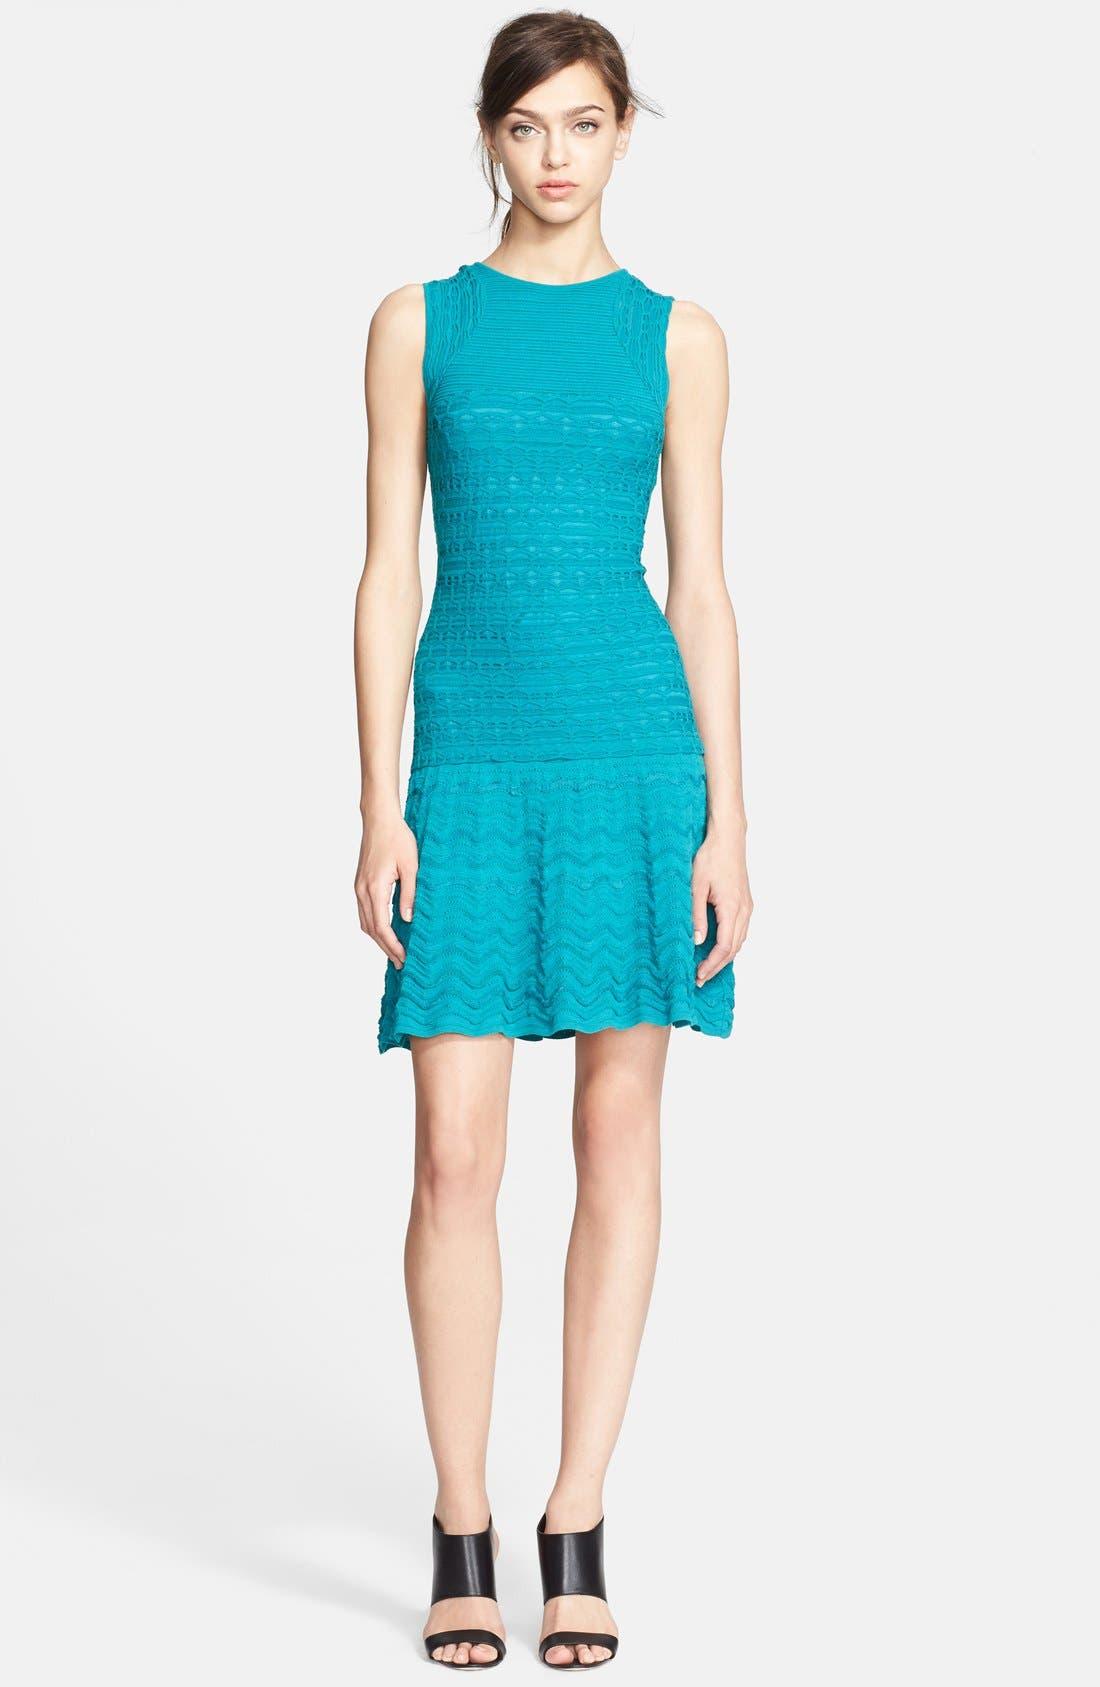 Alternate Image 1 Selected - M Missoni Sleeveless Crochet Knit Dress